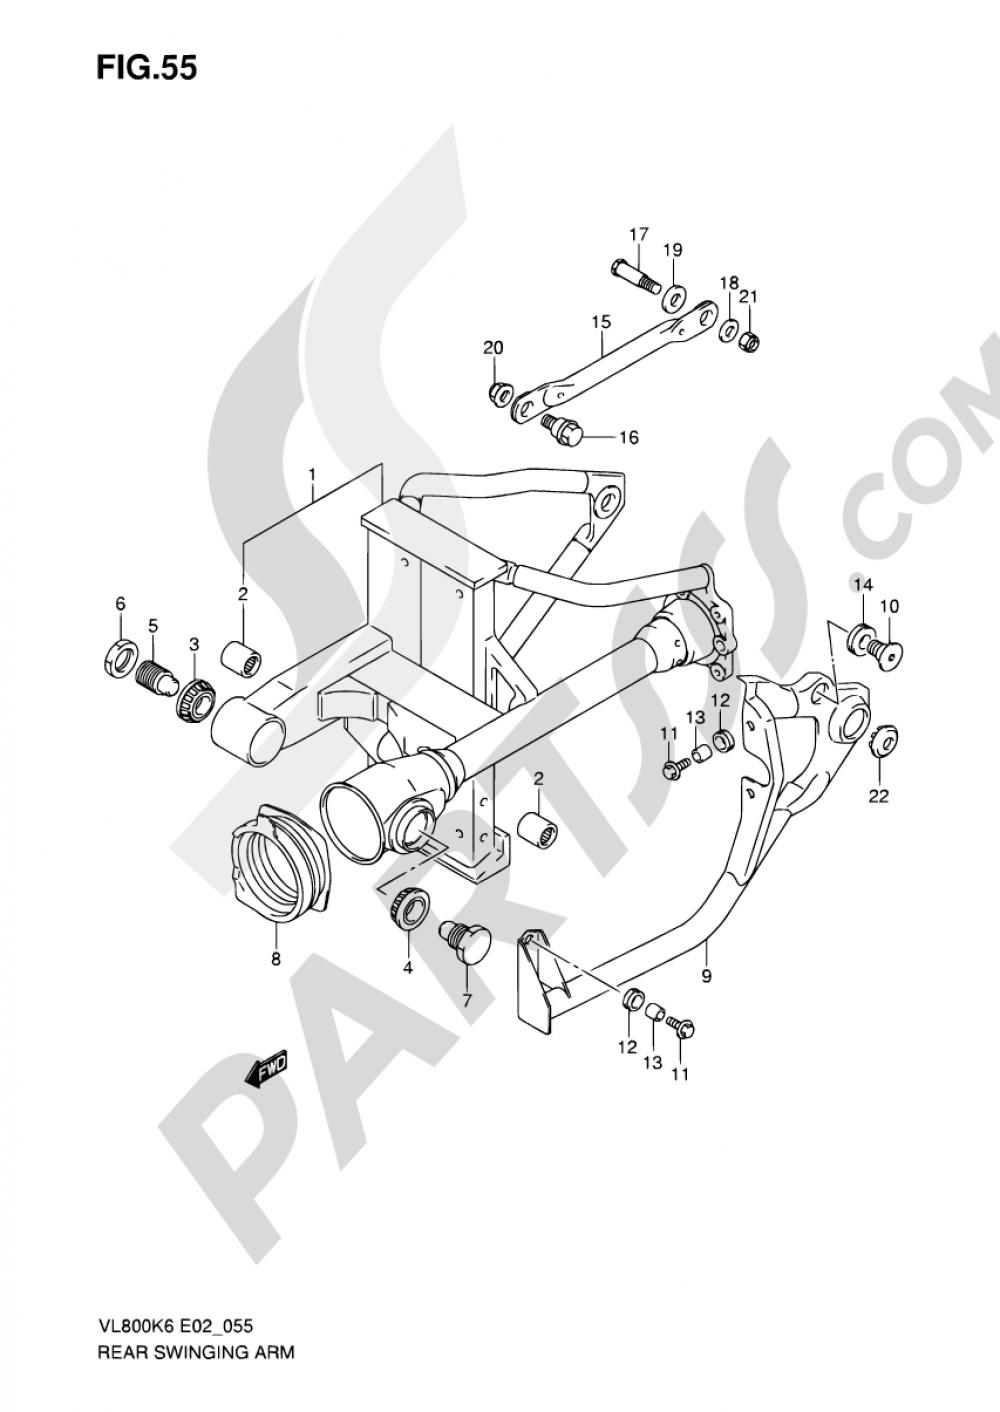 55 - REAR SWINGING ARM Suzuki INTRUDER VL800 2010